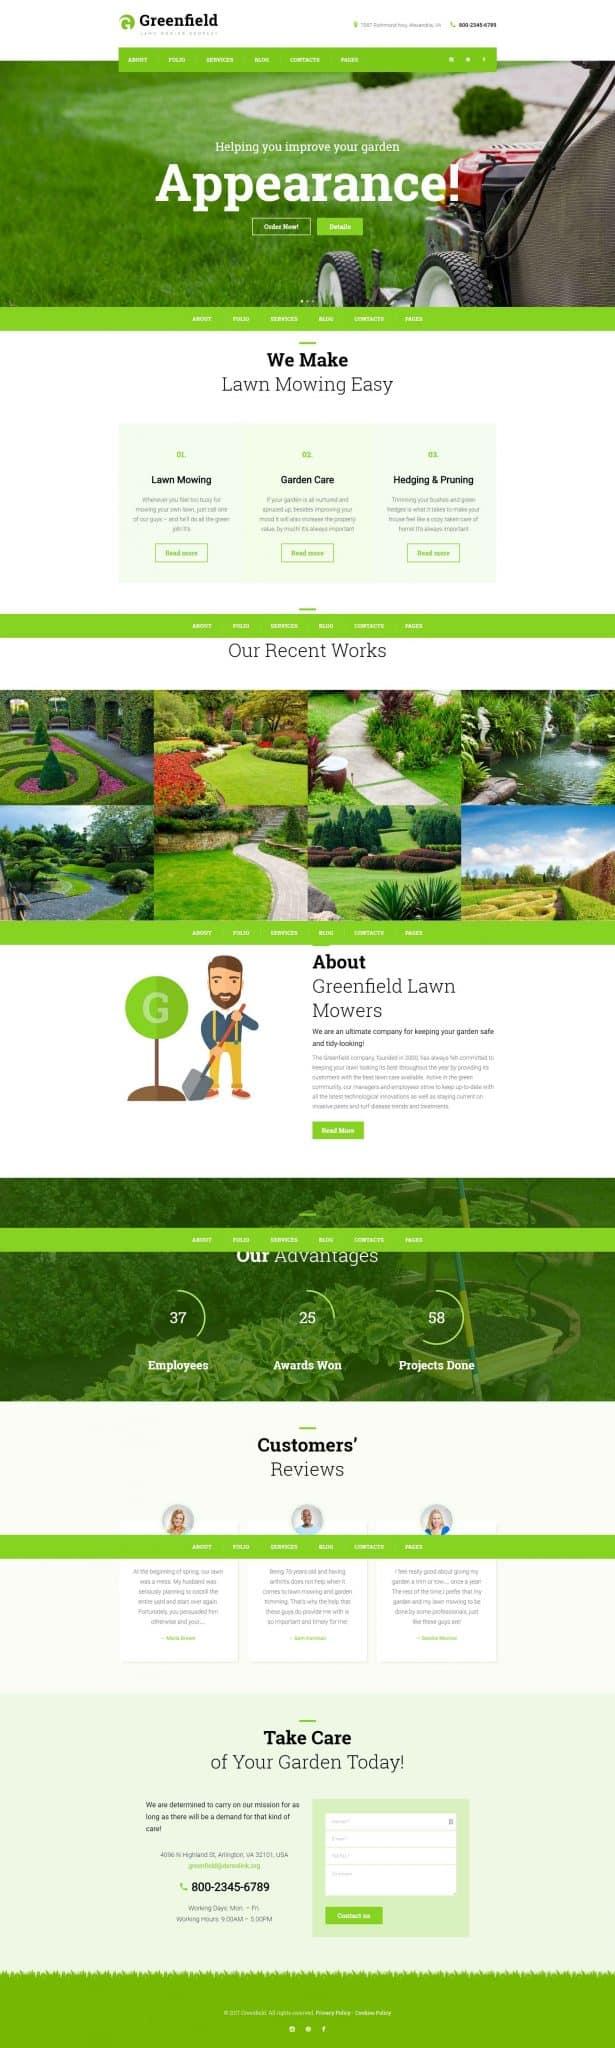 Lawn Care Landscaping Website Design Seo Optimized Designs